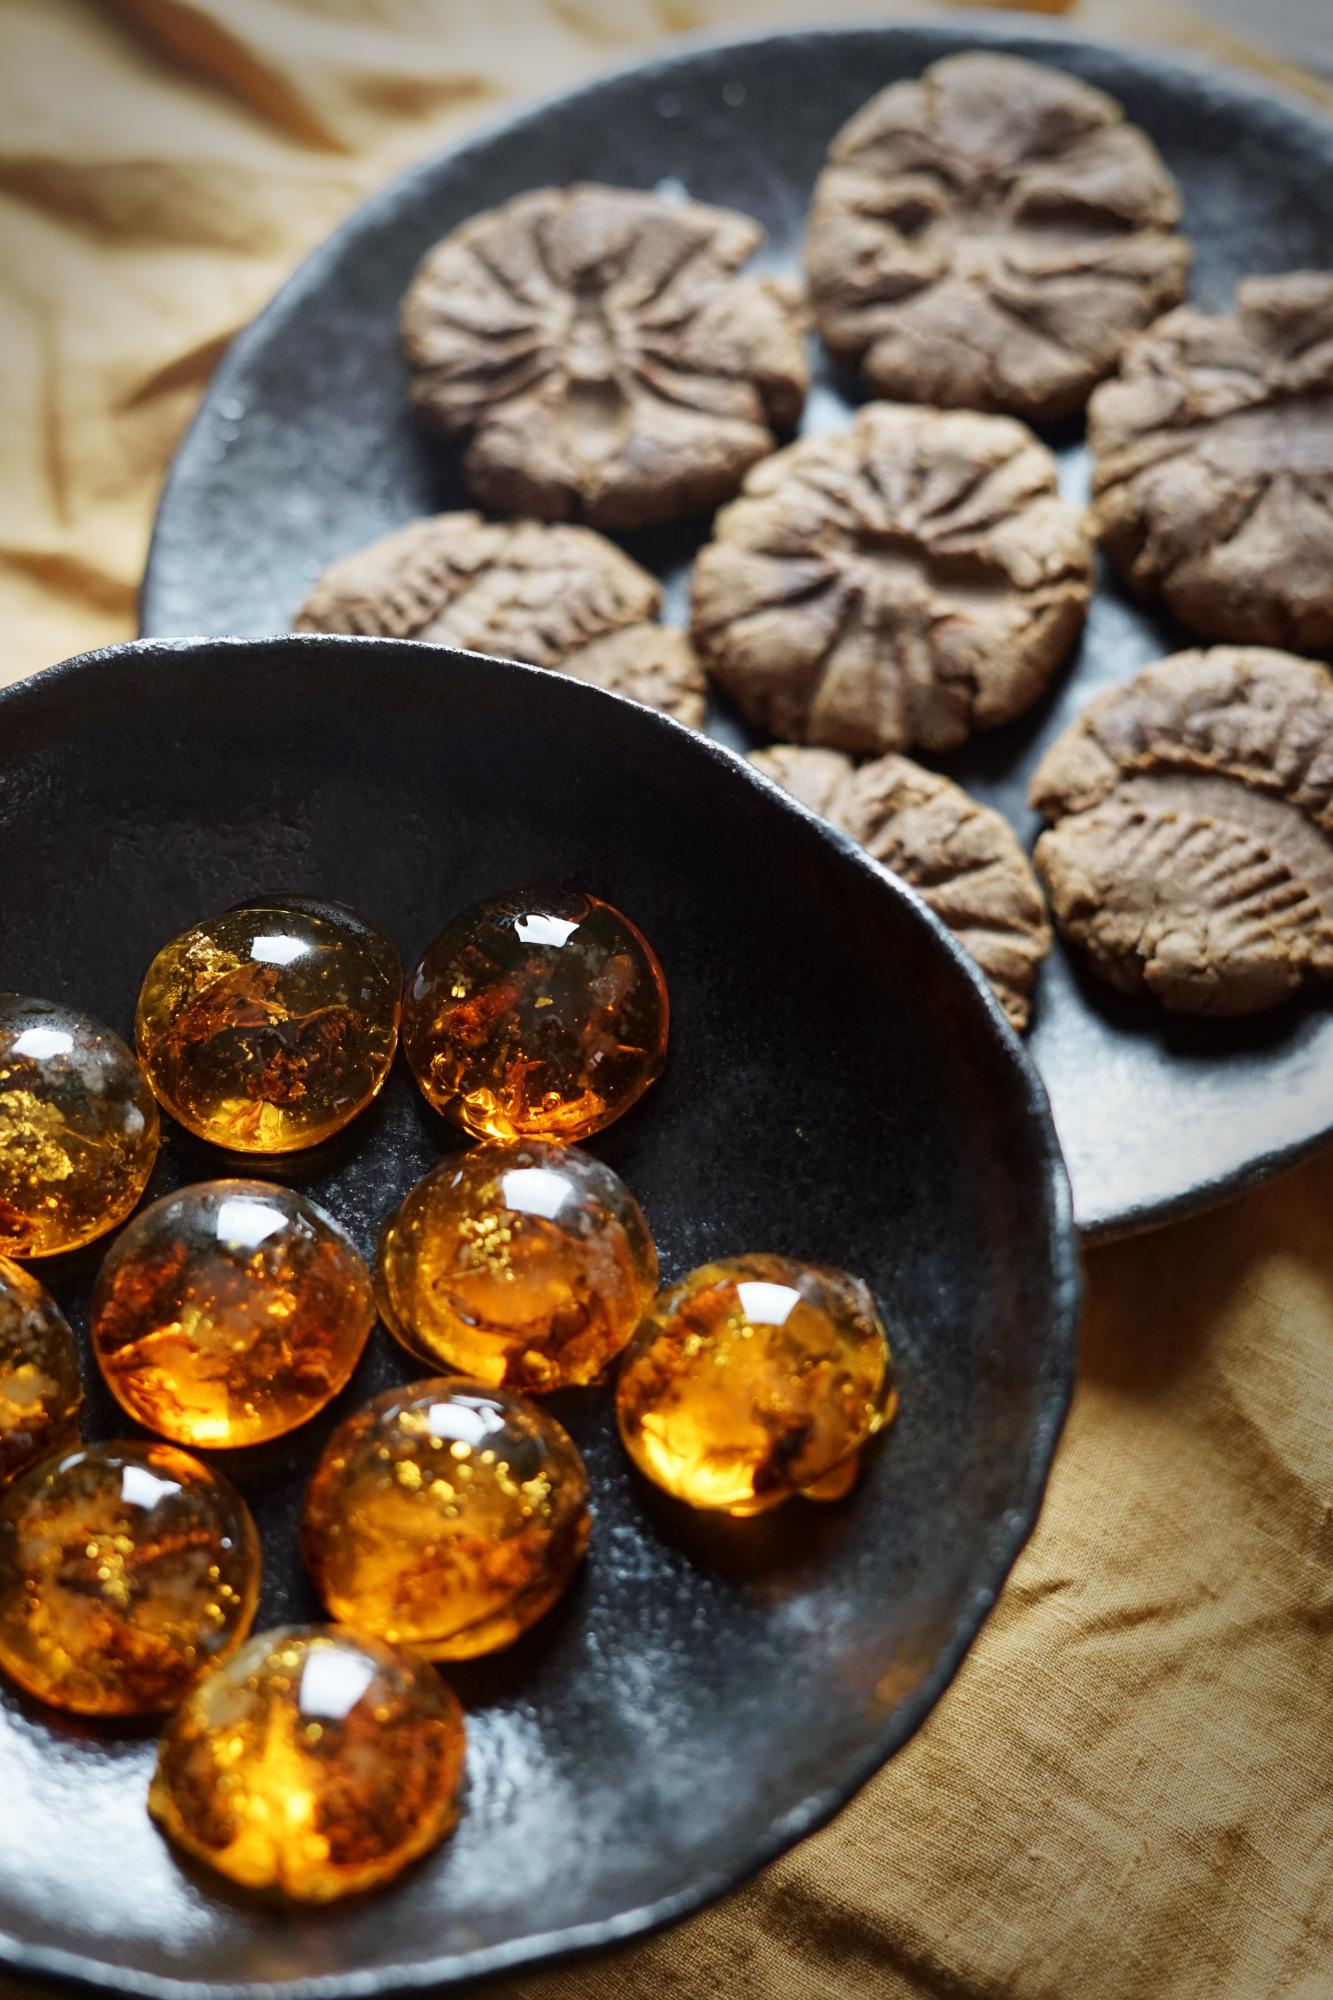 fossilcookies4small.jpg